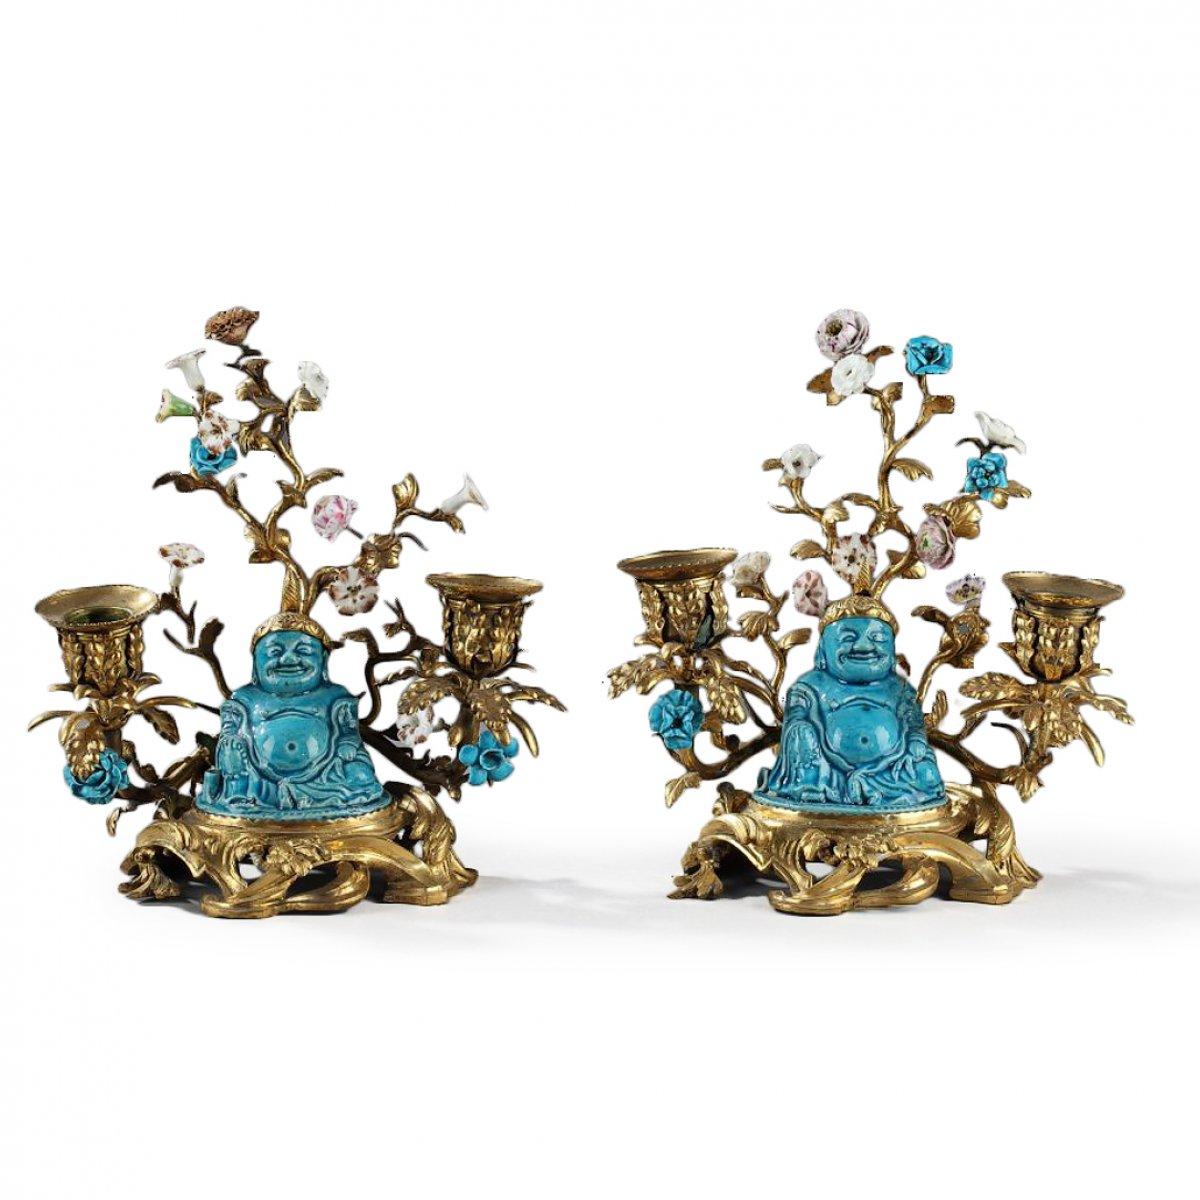 Paris Porcelain Art Nouveau Period Lamp Chinese Taste: Chinese Buddhais KANGXI Period (1662